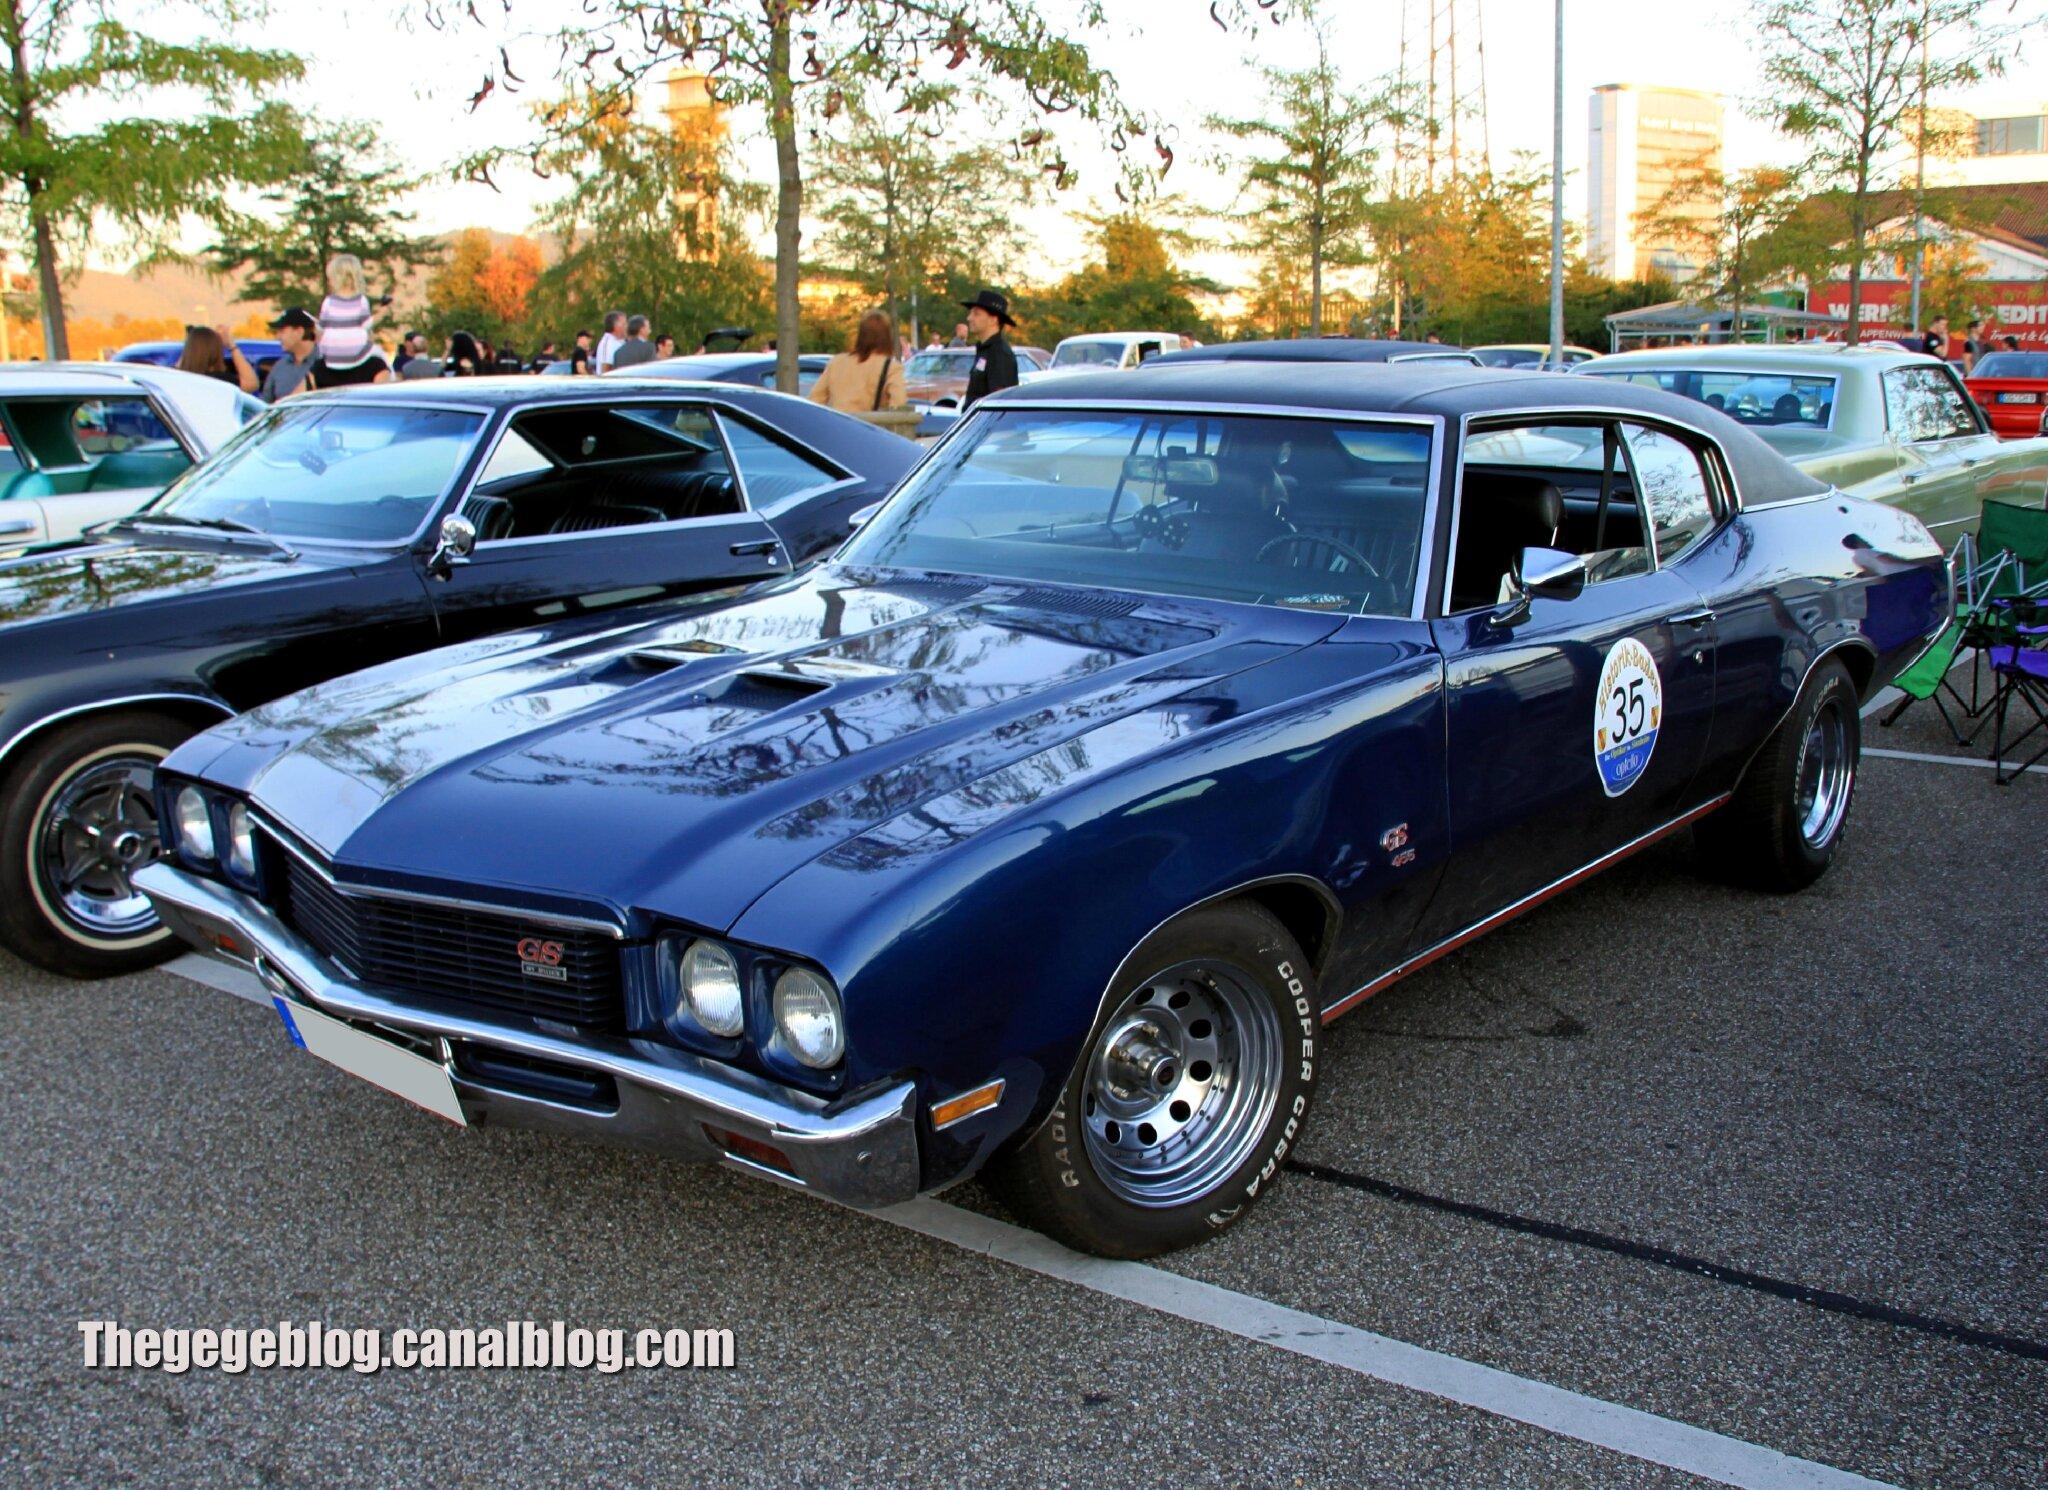 Buick GS 455 hardtop coupe de 1971 (Rencard Burger King septembre 2012) 01